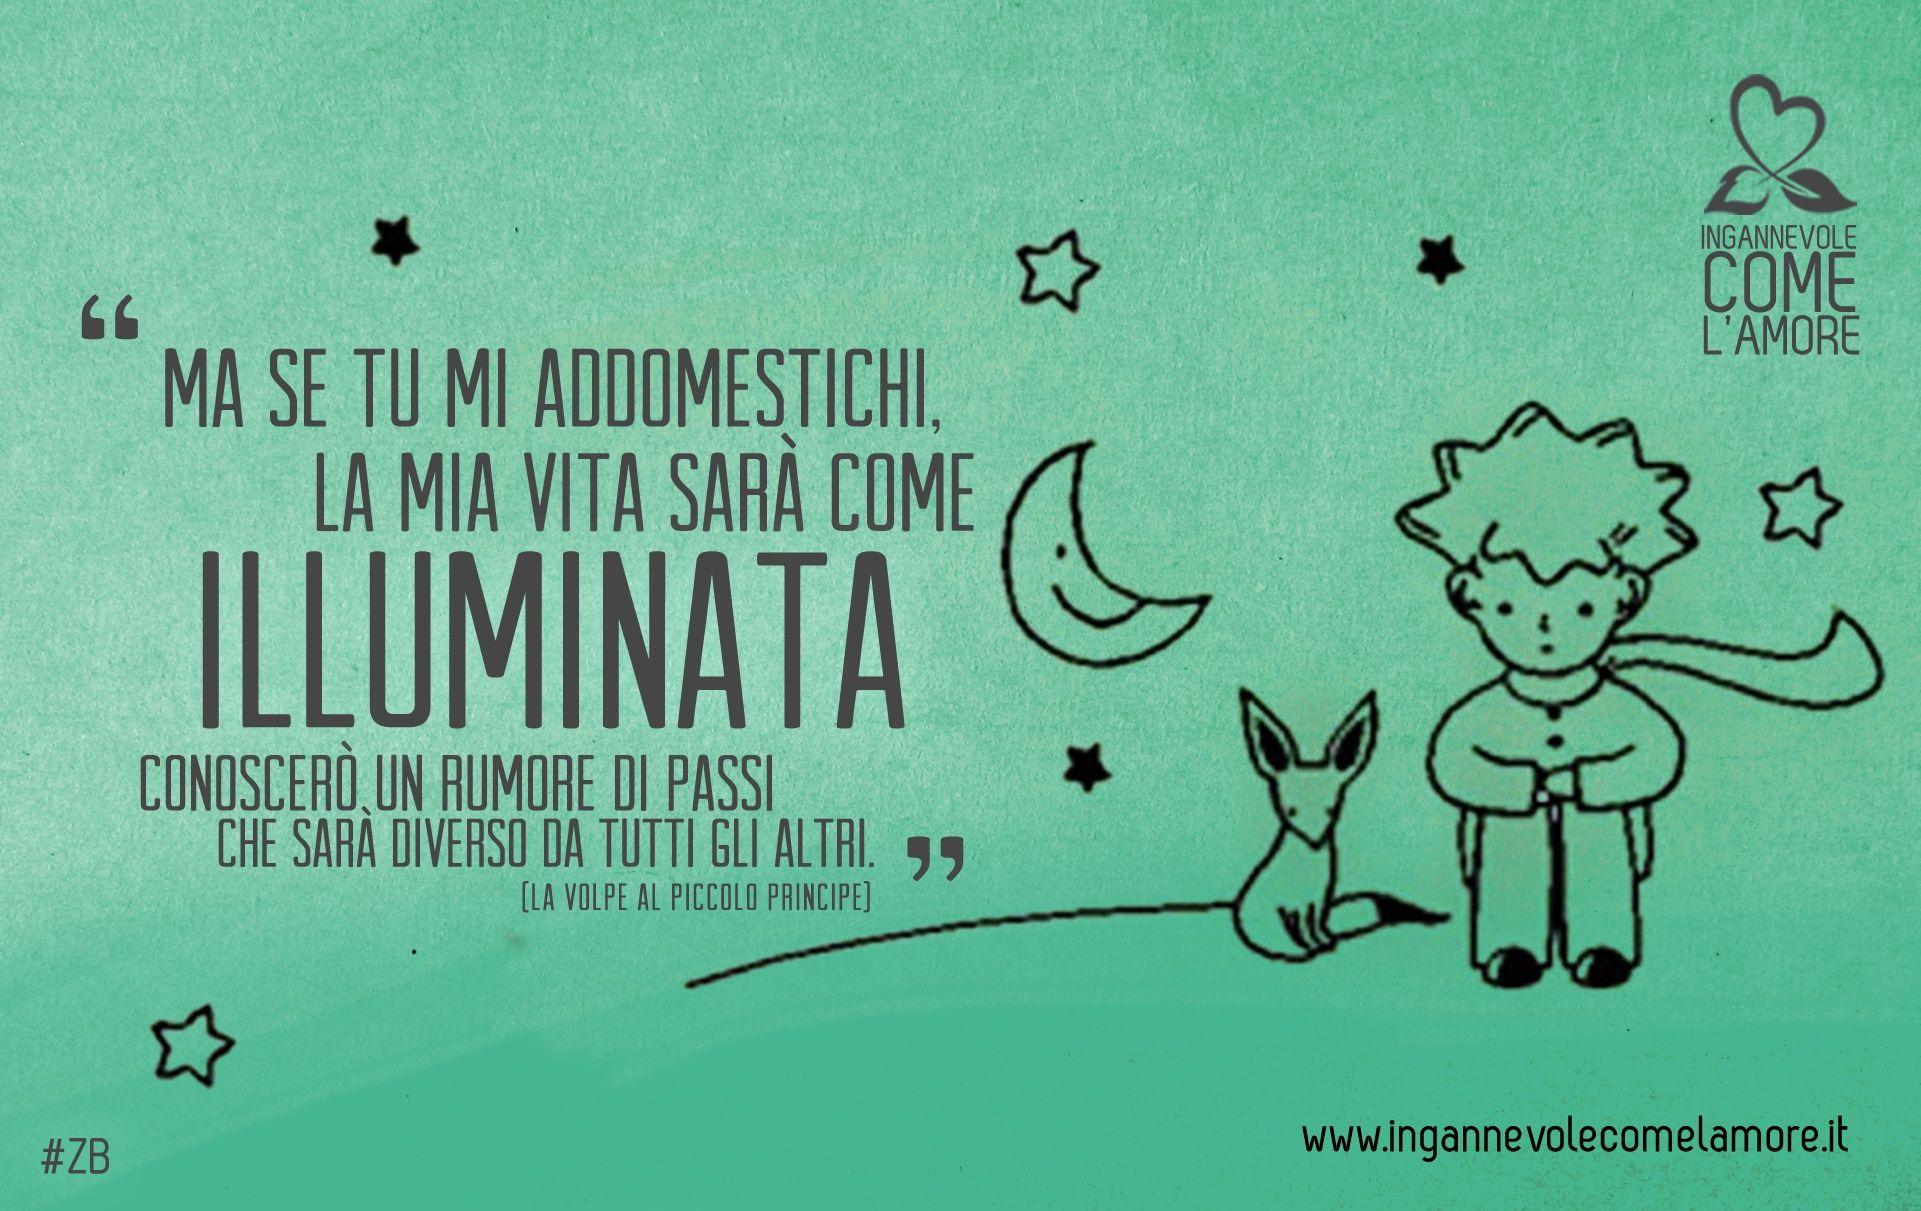 The Little Prince Uploaded By Vytaa On We Heart It: Disse La Volpe Al Piccolo Principe